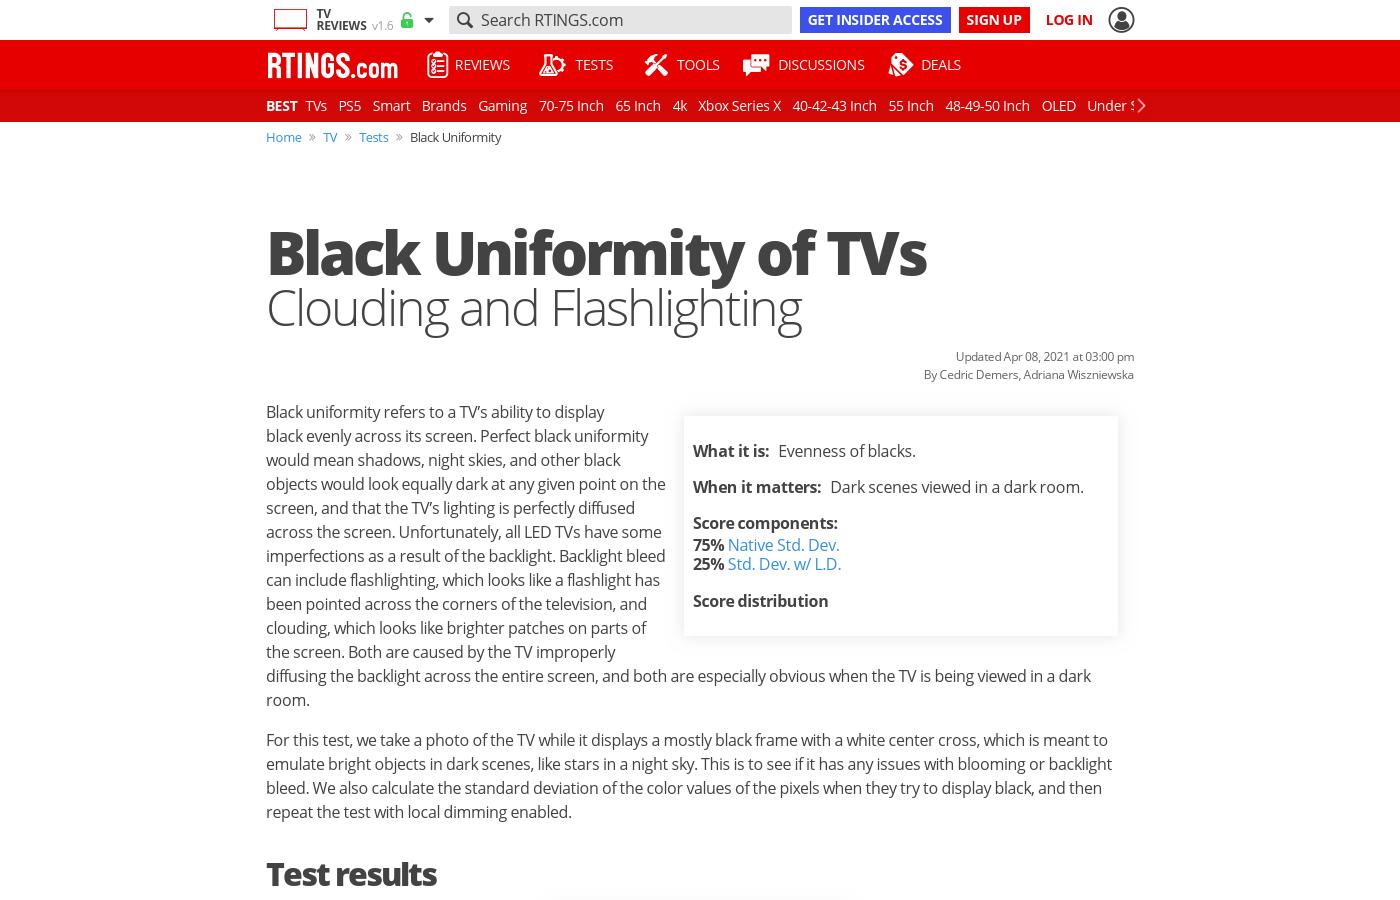 Black Uniformity of TVs: Clouding and Flashlighting - RTINGS com